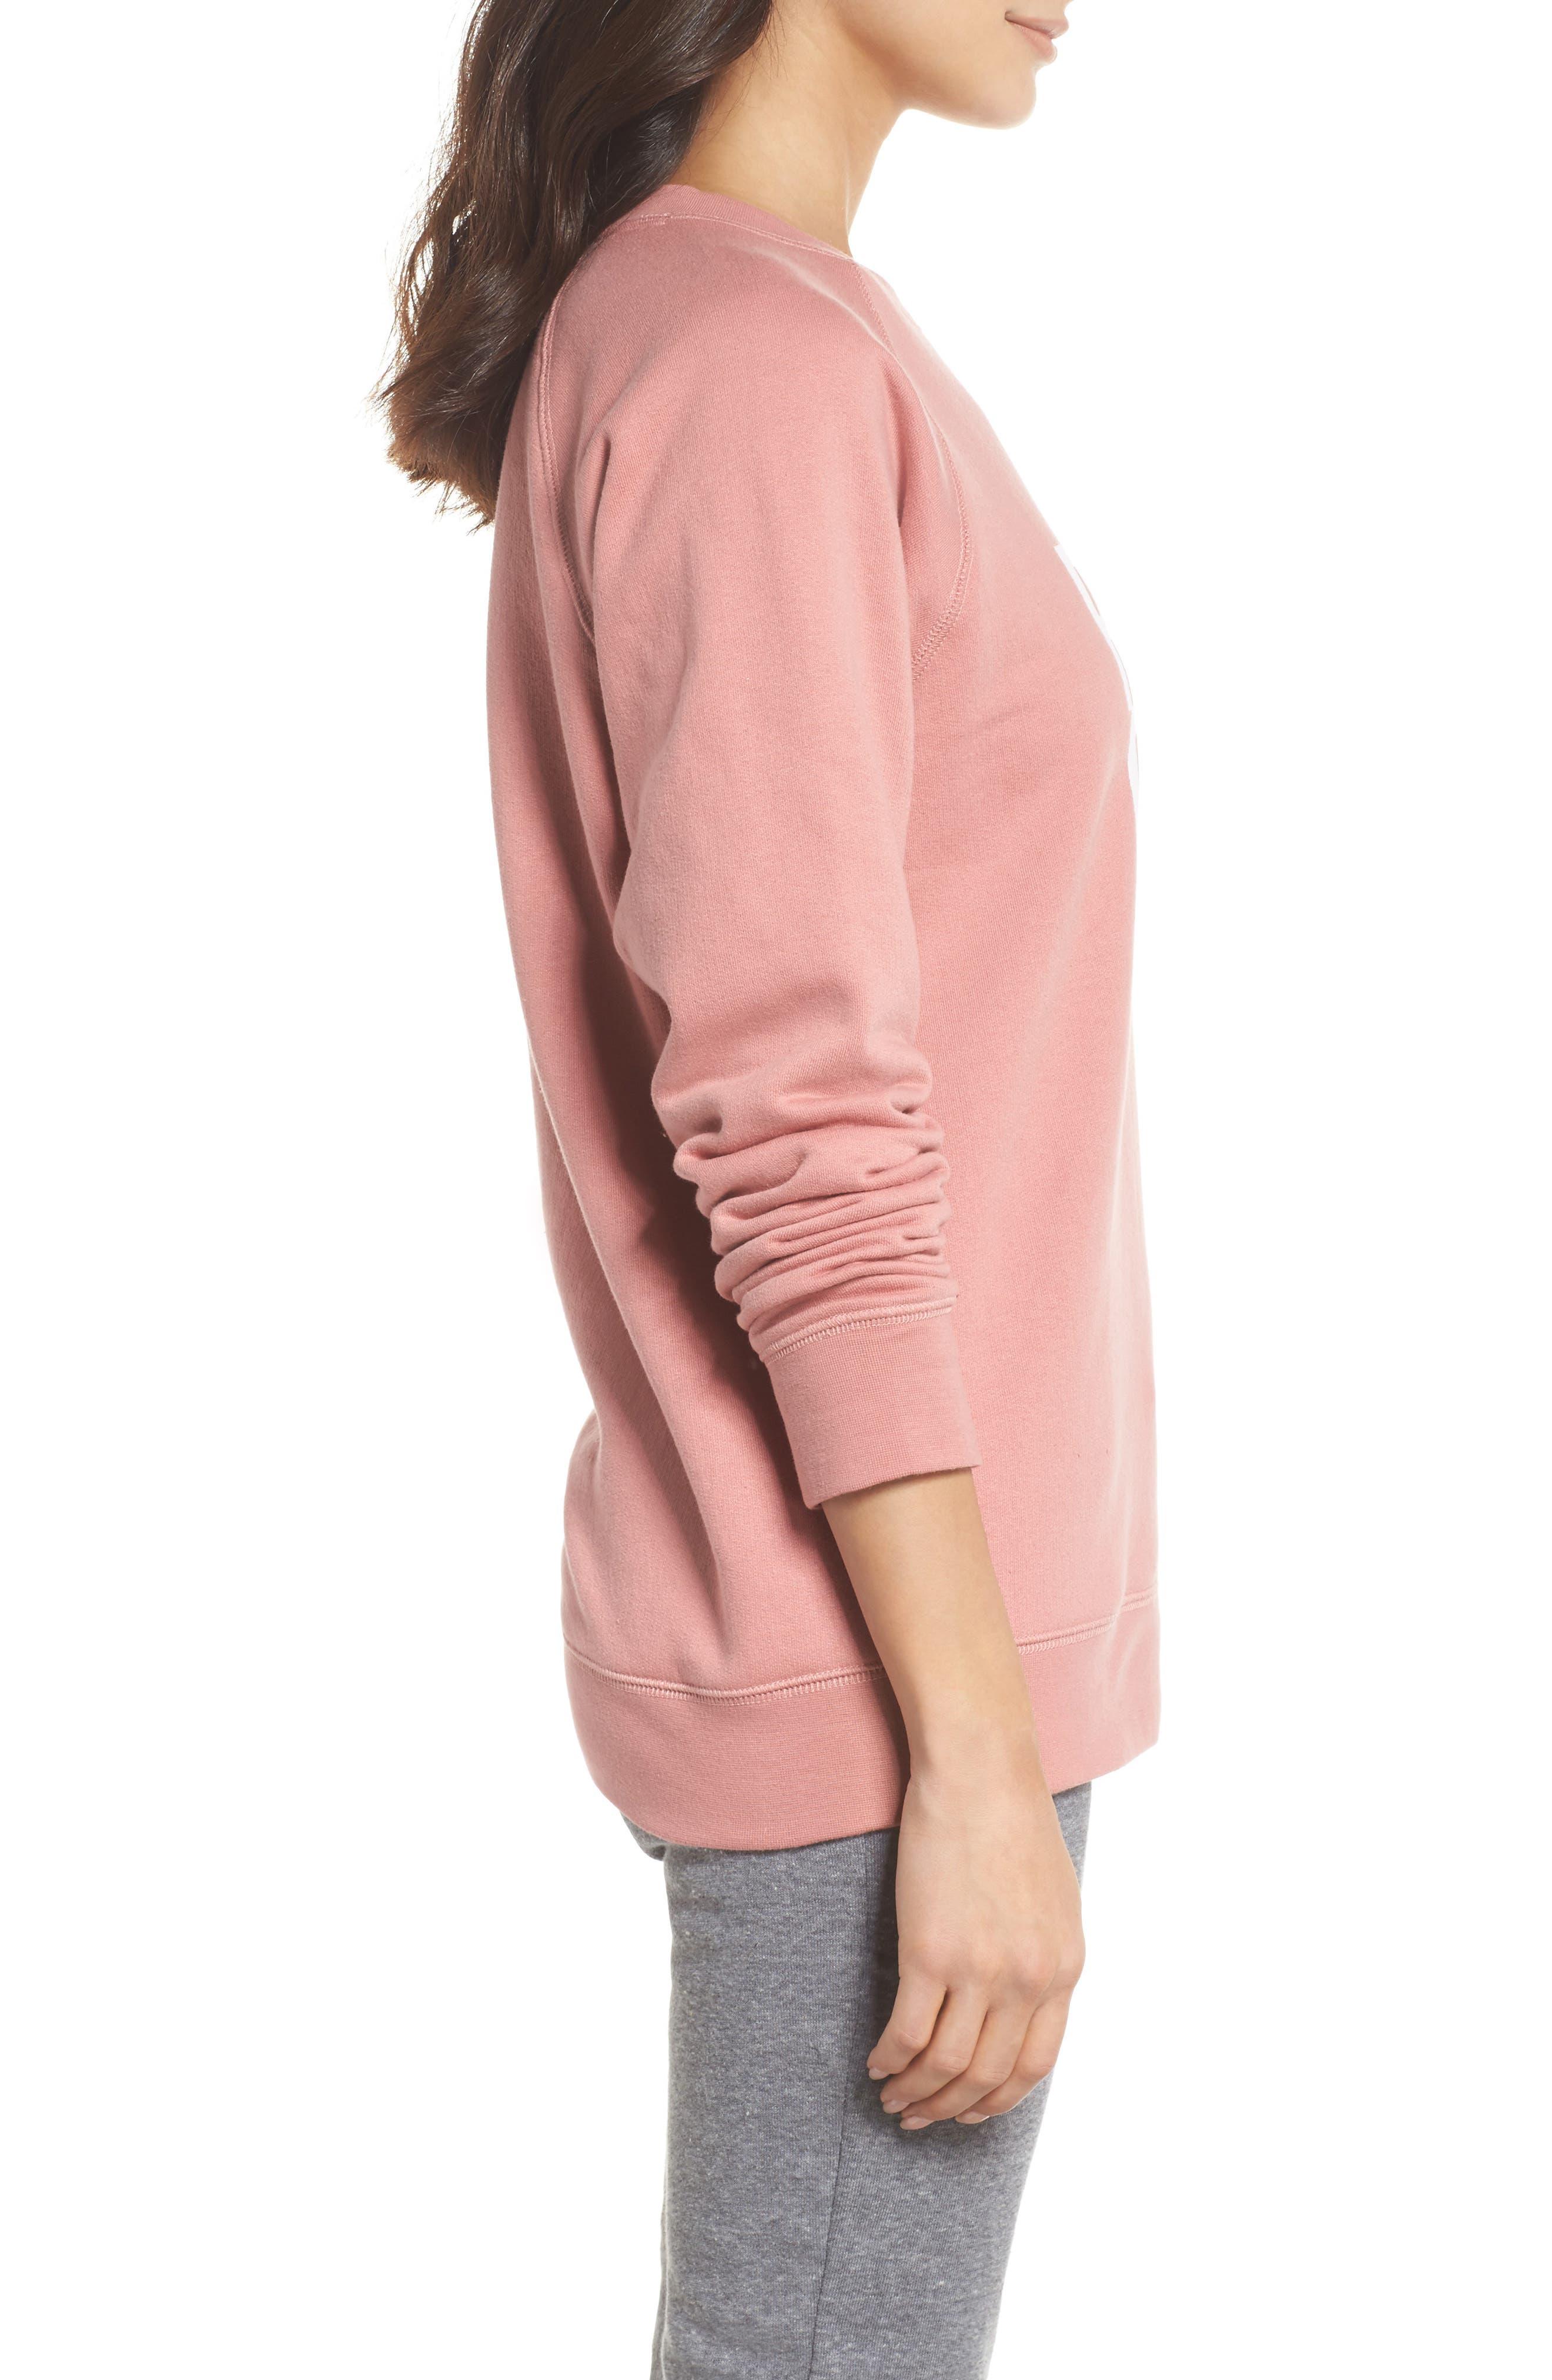 Rosé Okay Sweatshirt,                             Alternate thumbnail 3, color,                             DUSTY ROSE